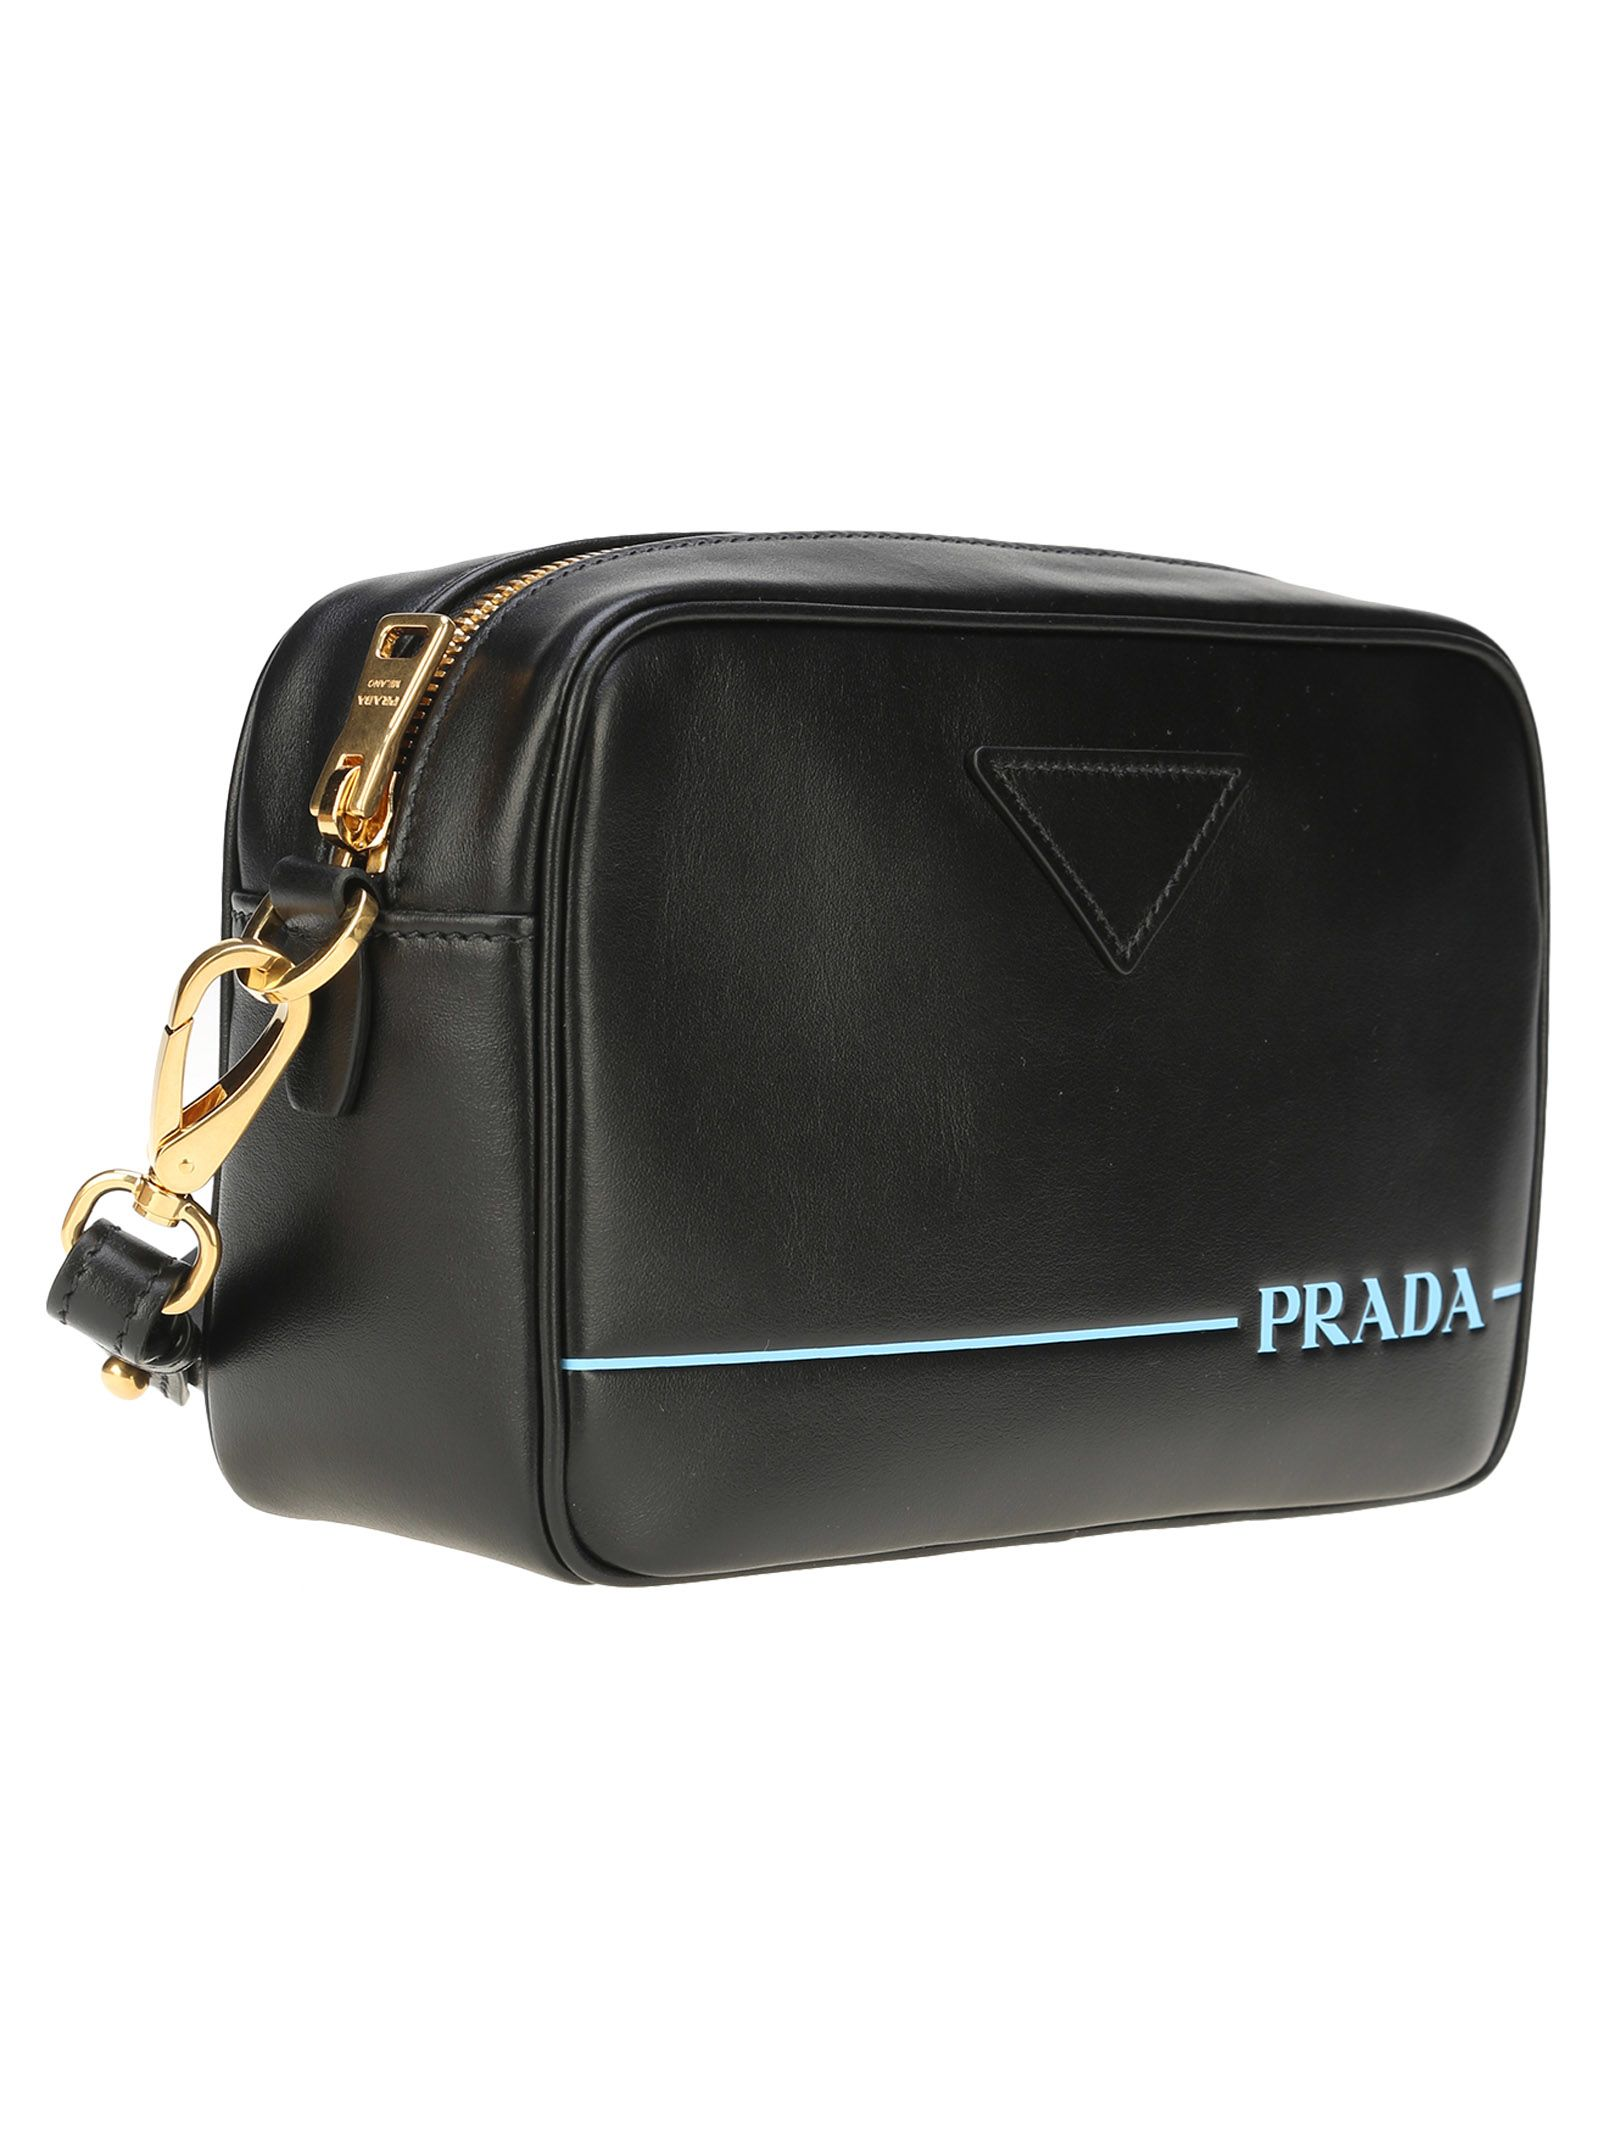 81daa8fbf80589 Prada Mirage Leather Shoulder Bag Price | Stanford Center for ...